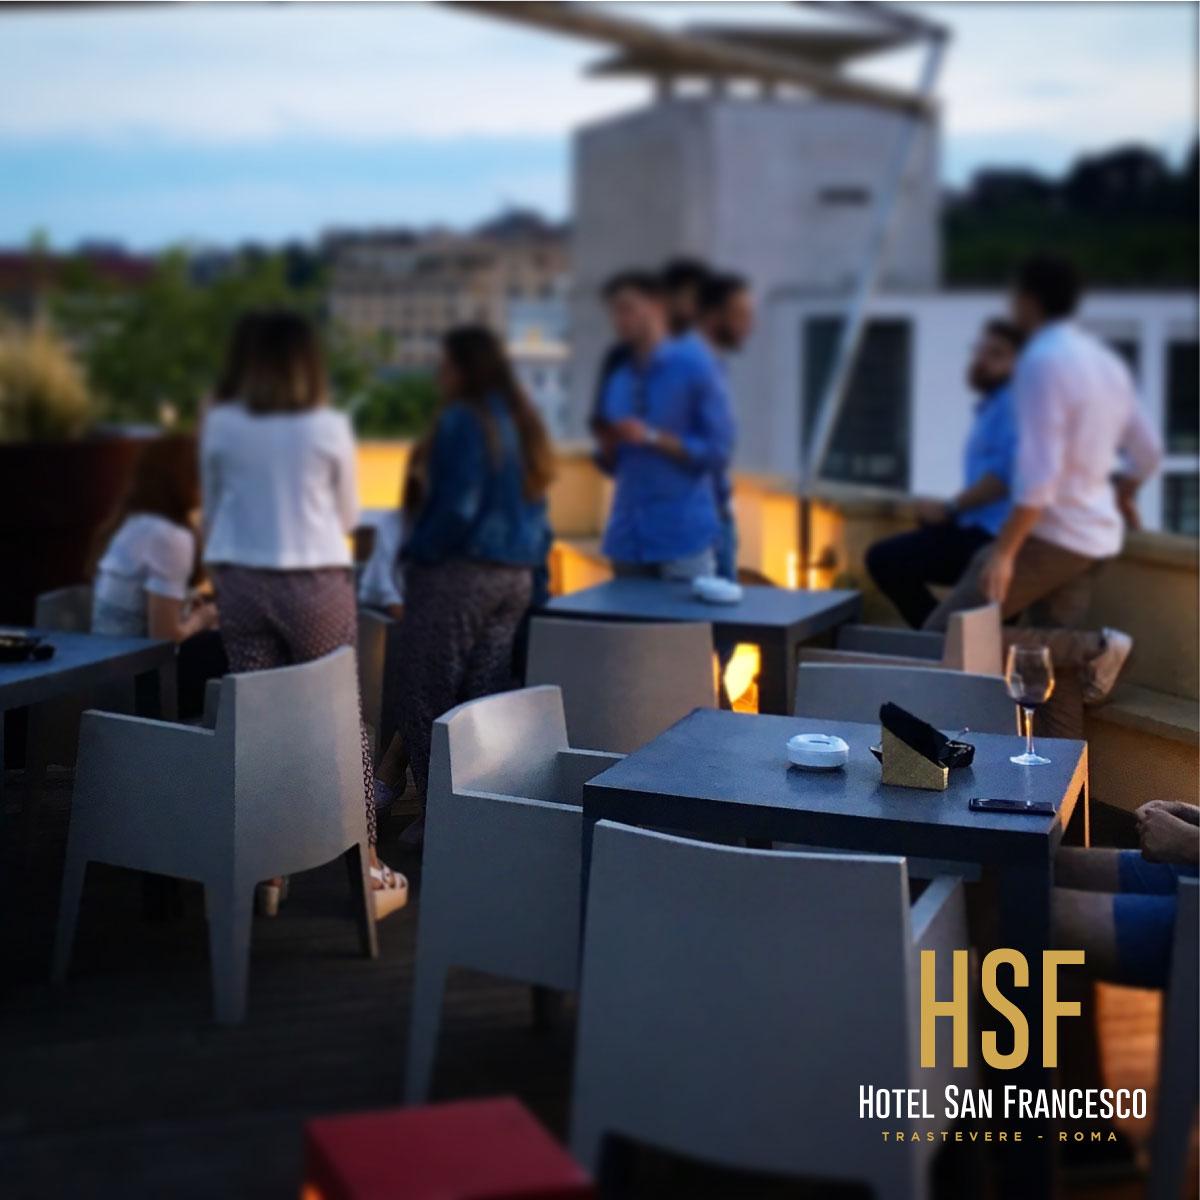 Hotel-San-Francesco-Rooftop-Bar-7.jpg